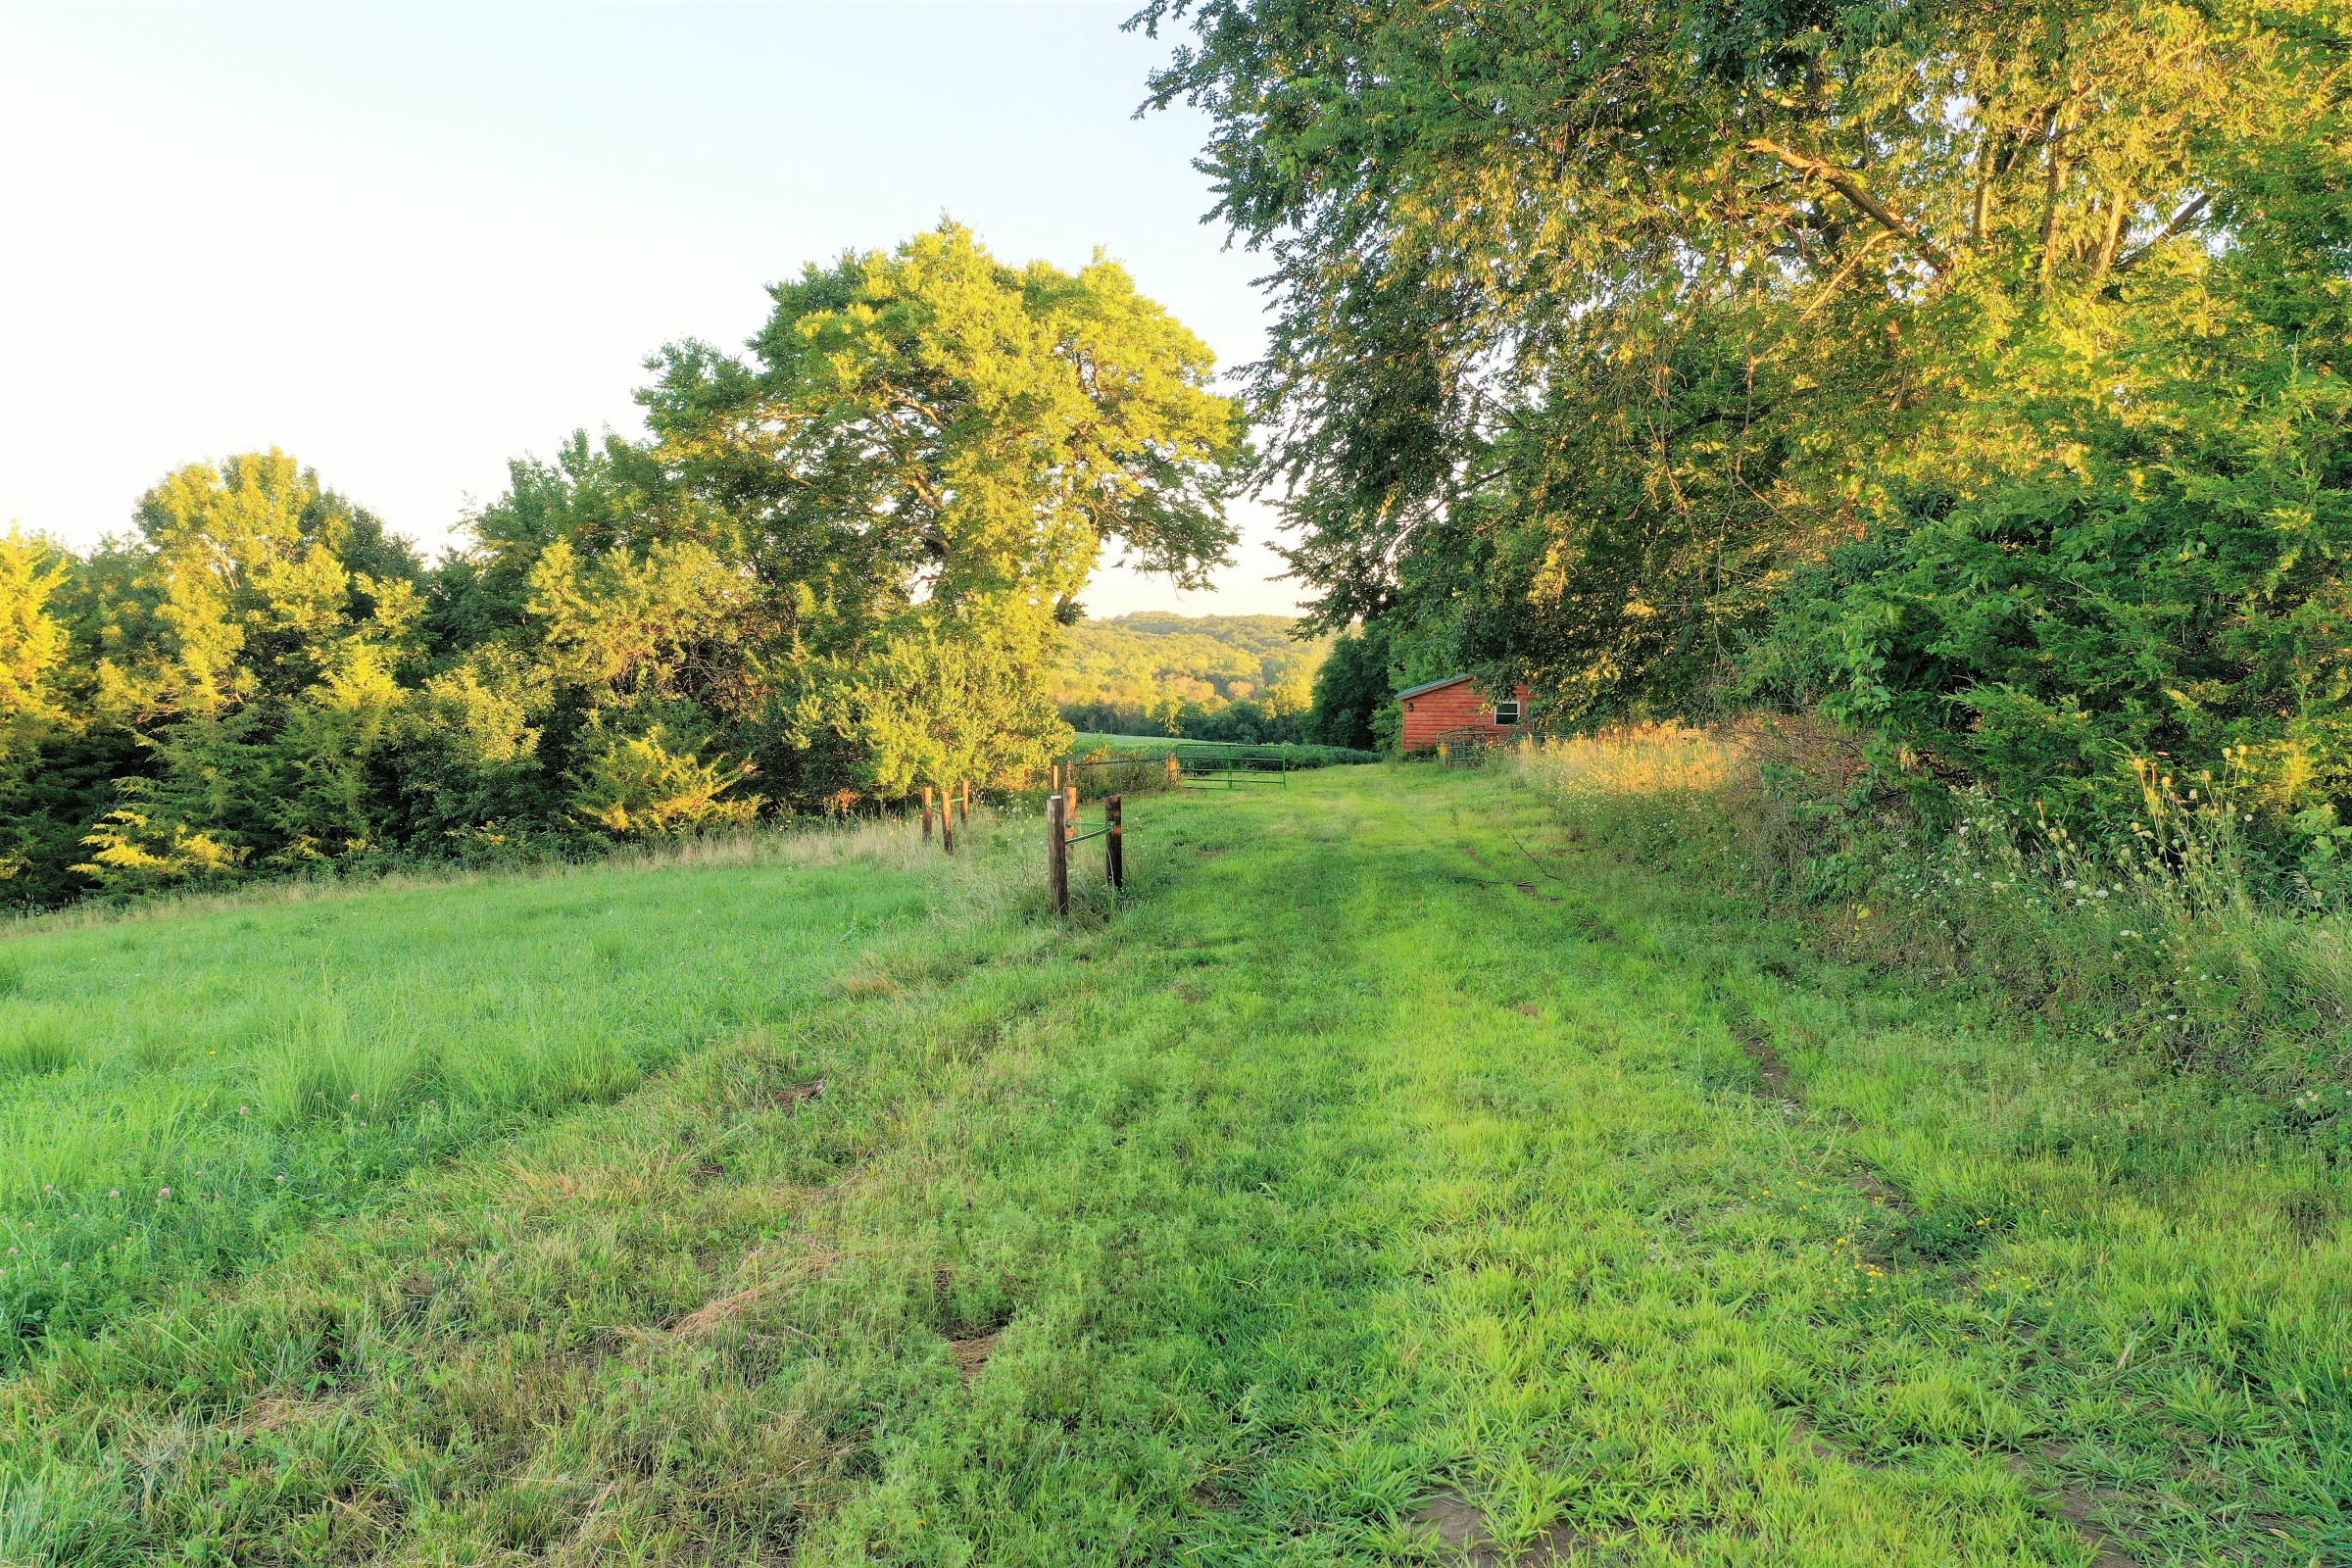 land-clarke-county-iowa-325-acres-listing-number-15416-3-2021-03-18-162754.JPG